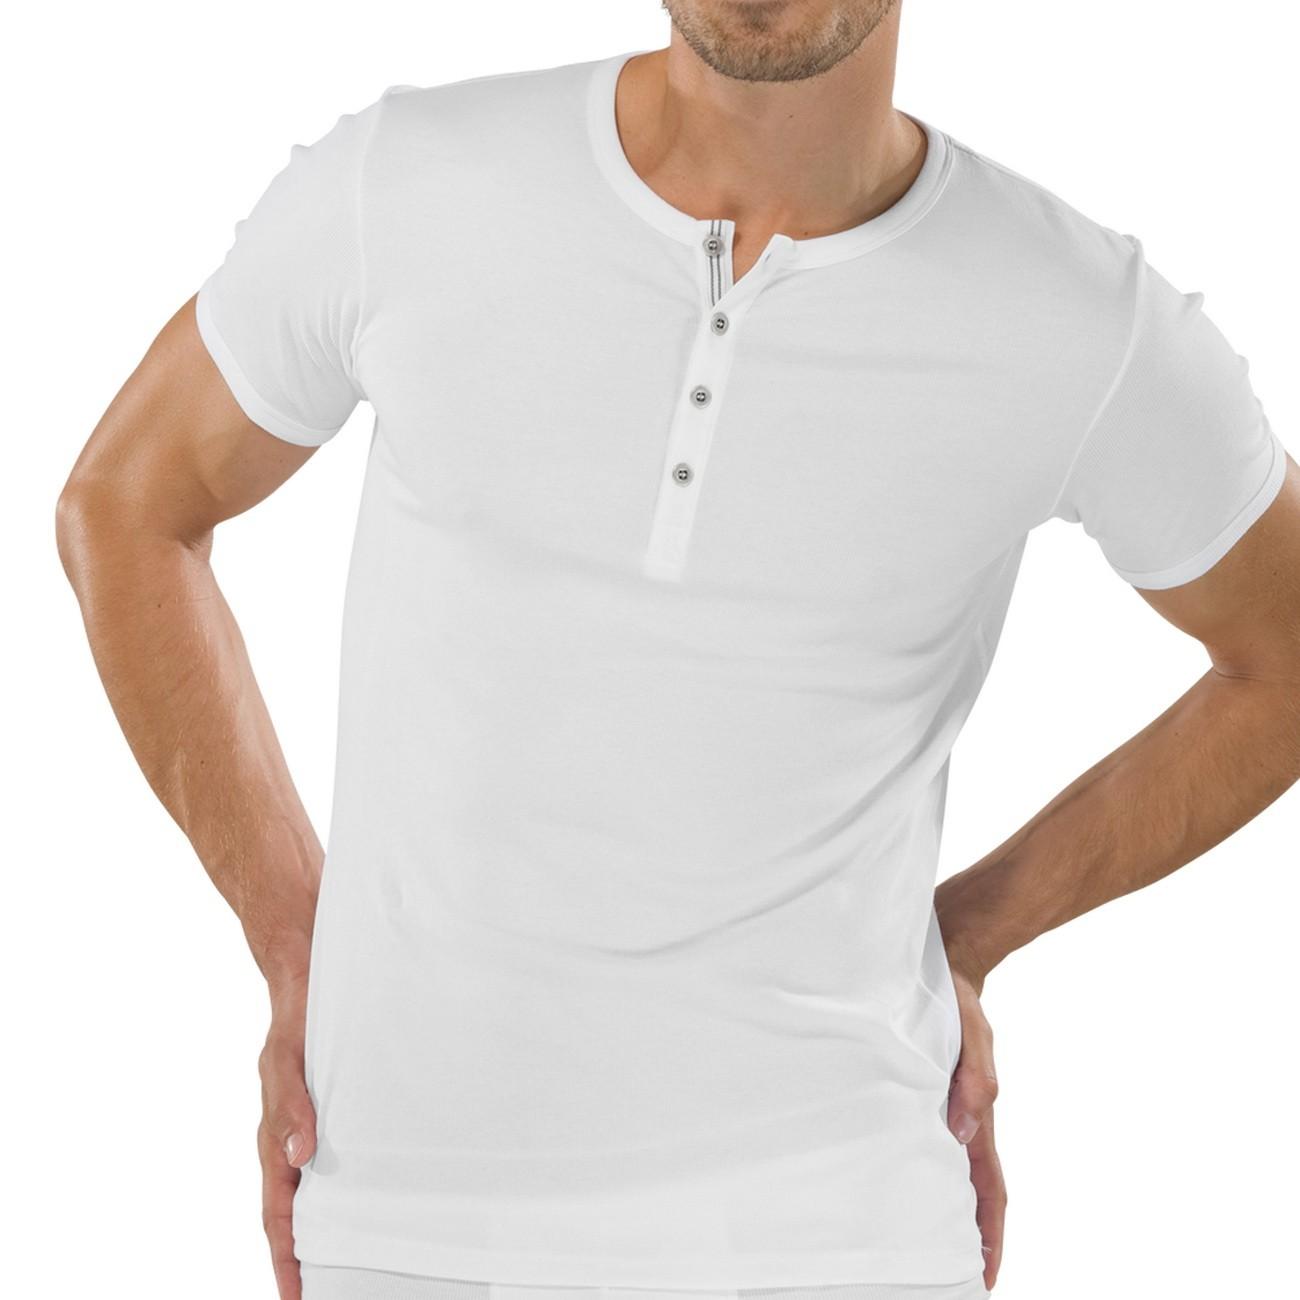 df76540d8d30b6 SCHIESSER Herren T-Shirt mit Knopfleiste Naturbursche 1er Pack